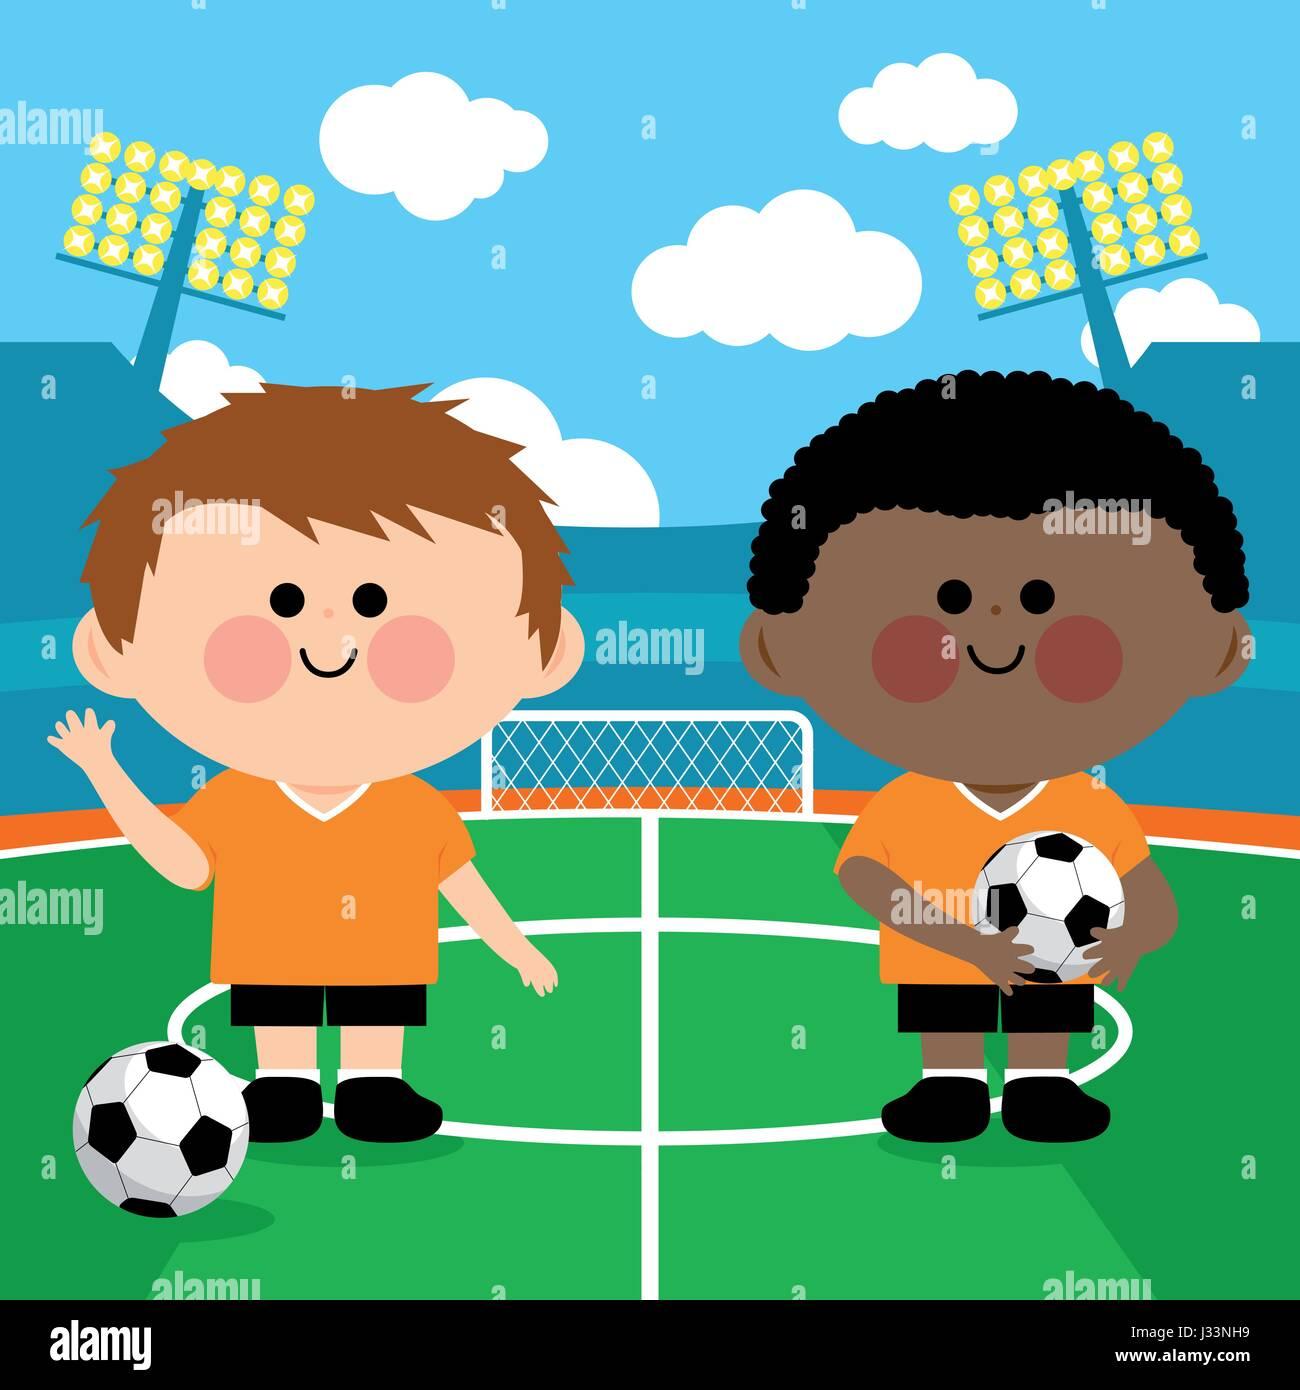 Children soccer players in a stadium. Vector illustration - Stock Vector